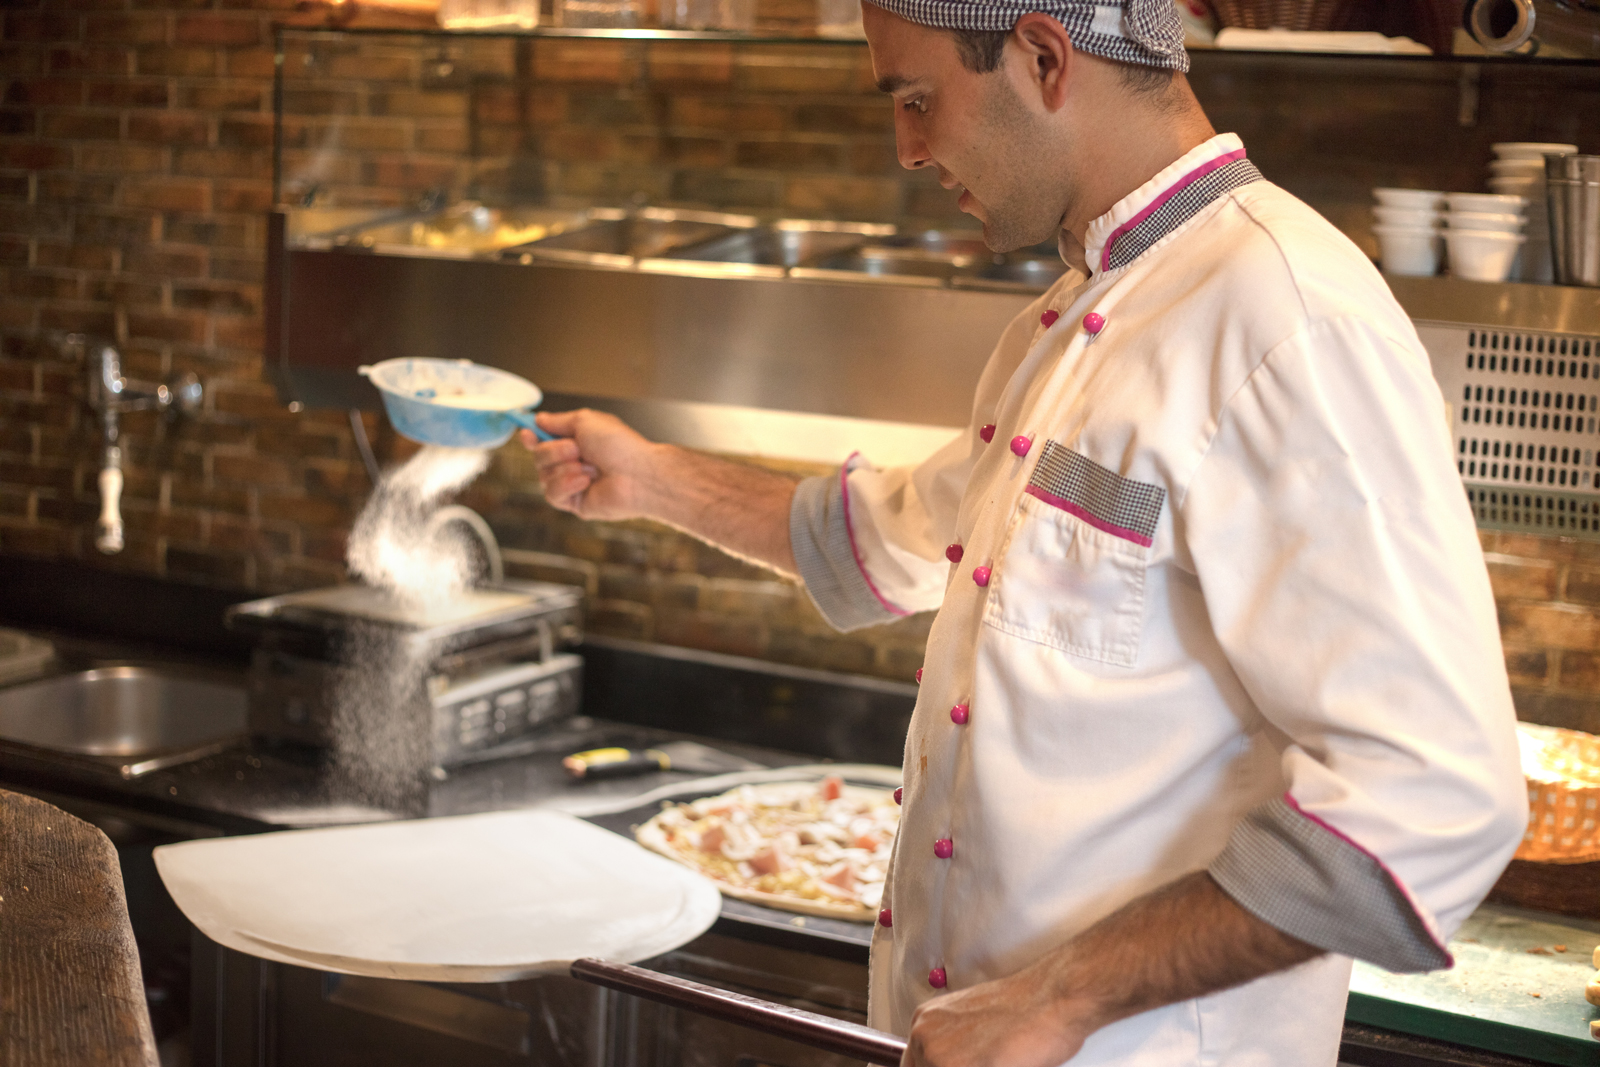 A restaurant chef sprinkles flour on pizza dough on pizza paddle